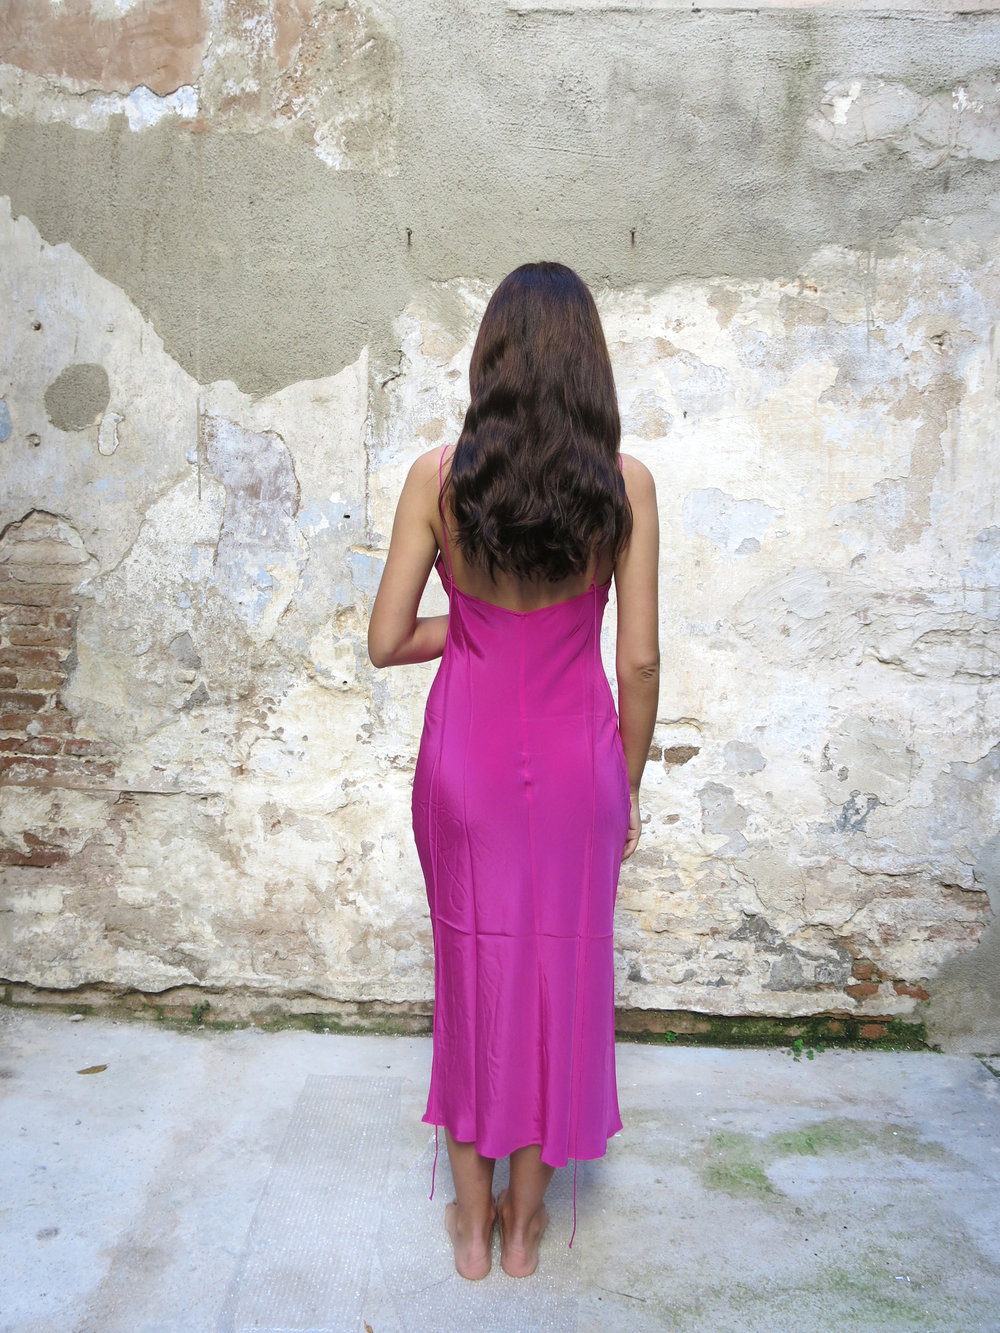 Vestido Fucsia Pari desai 04.jpg